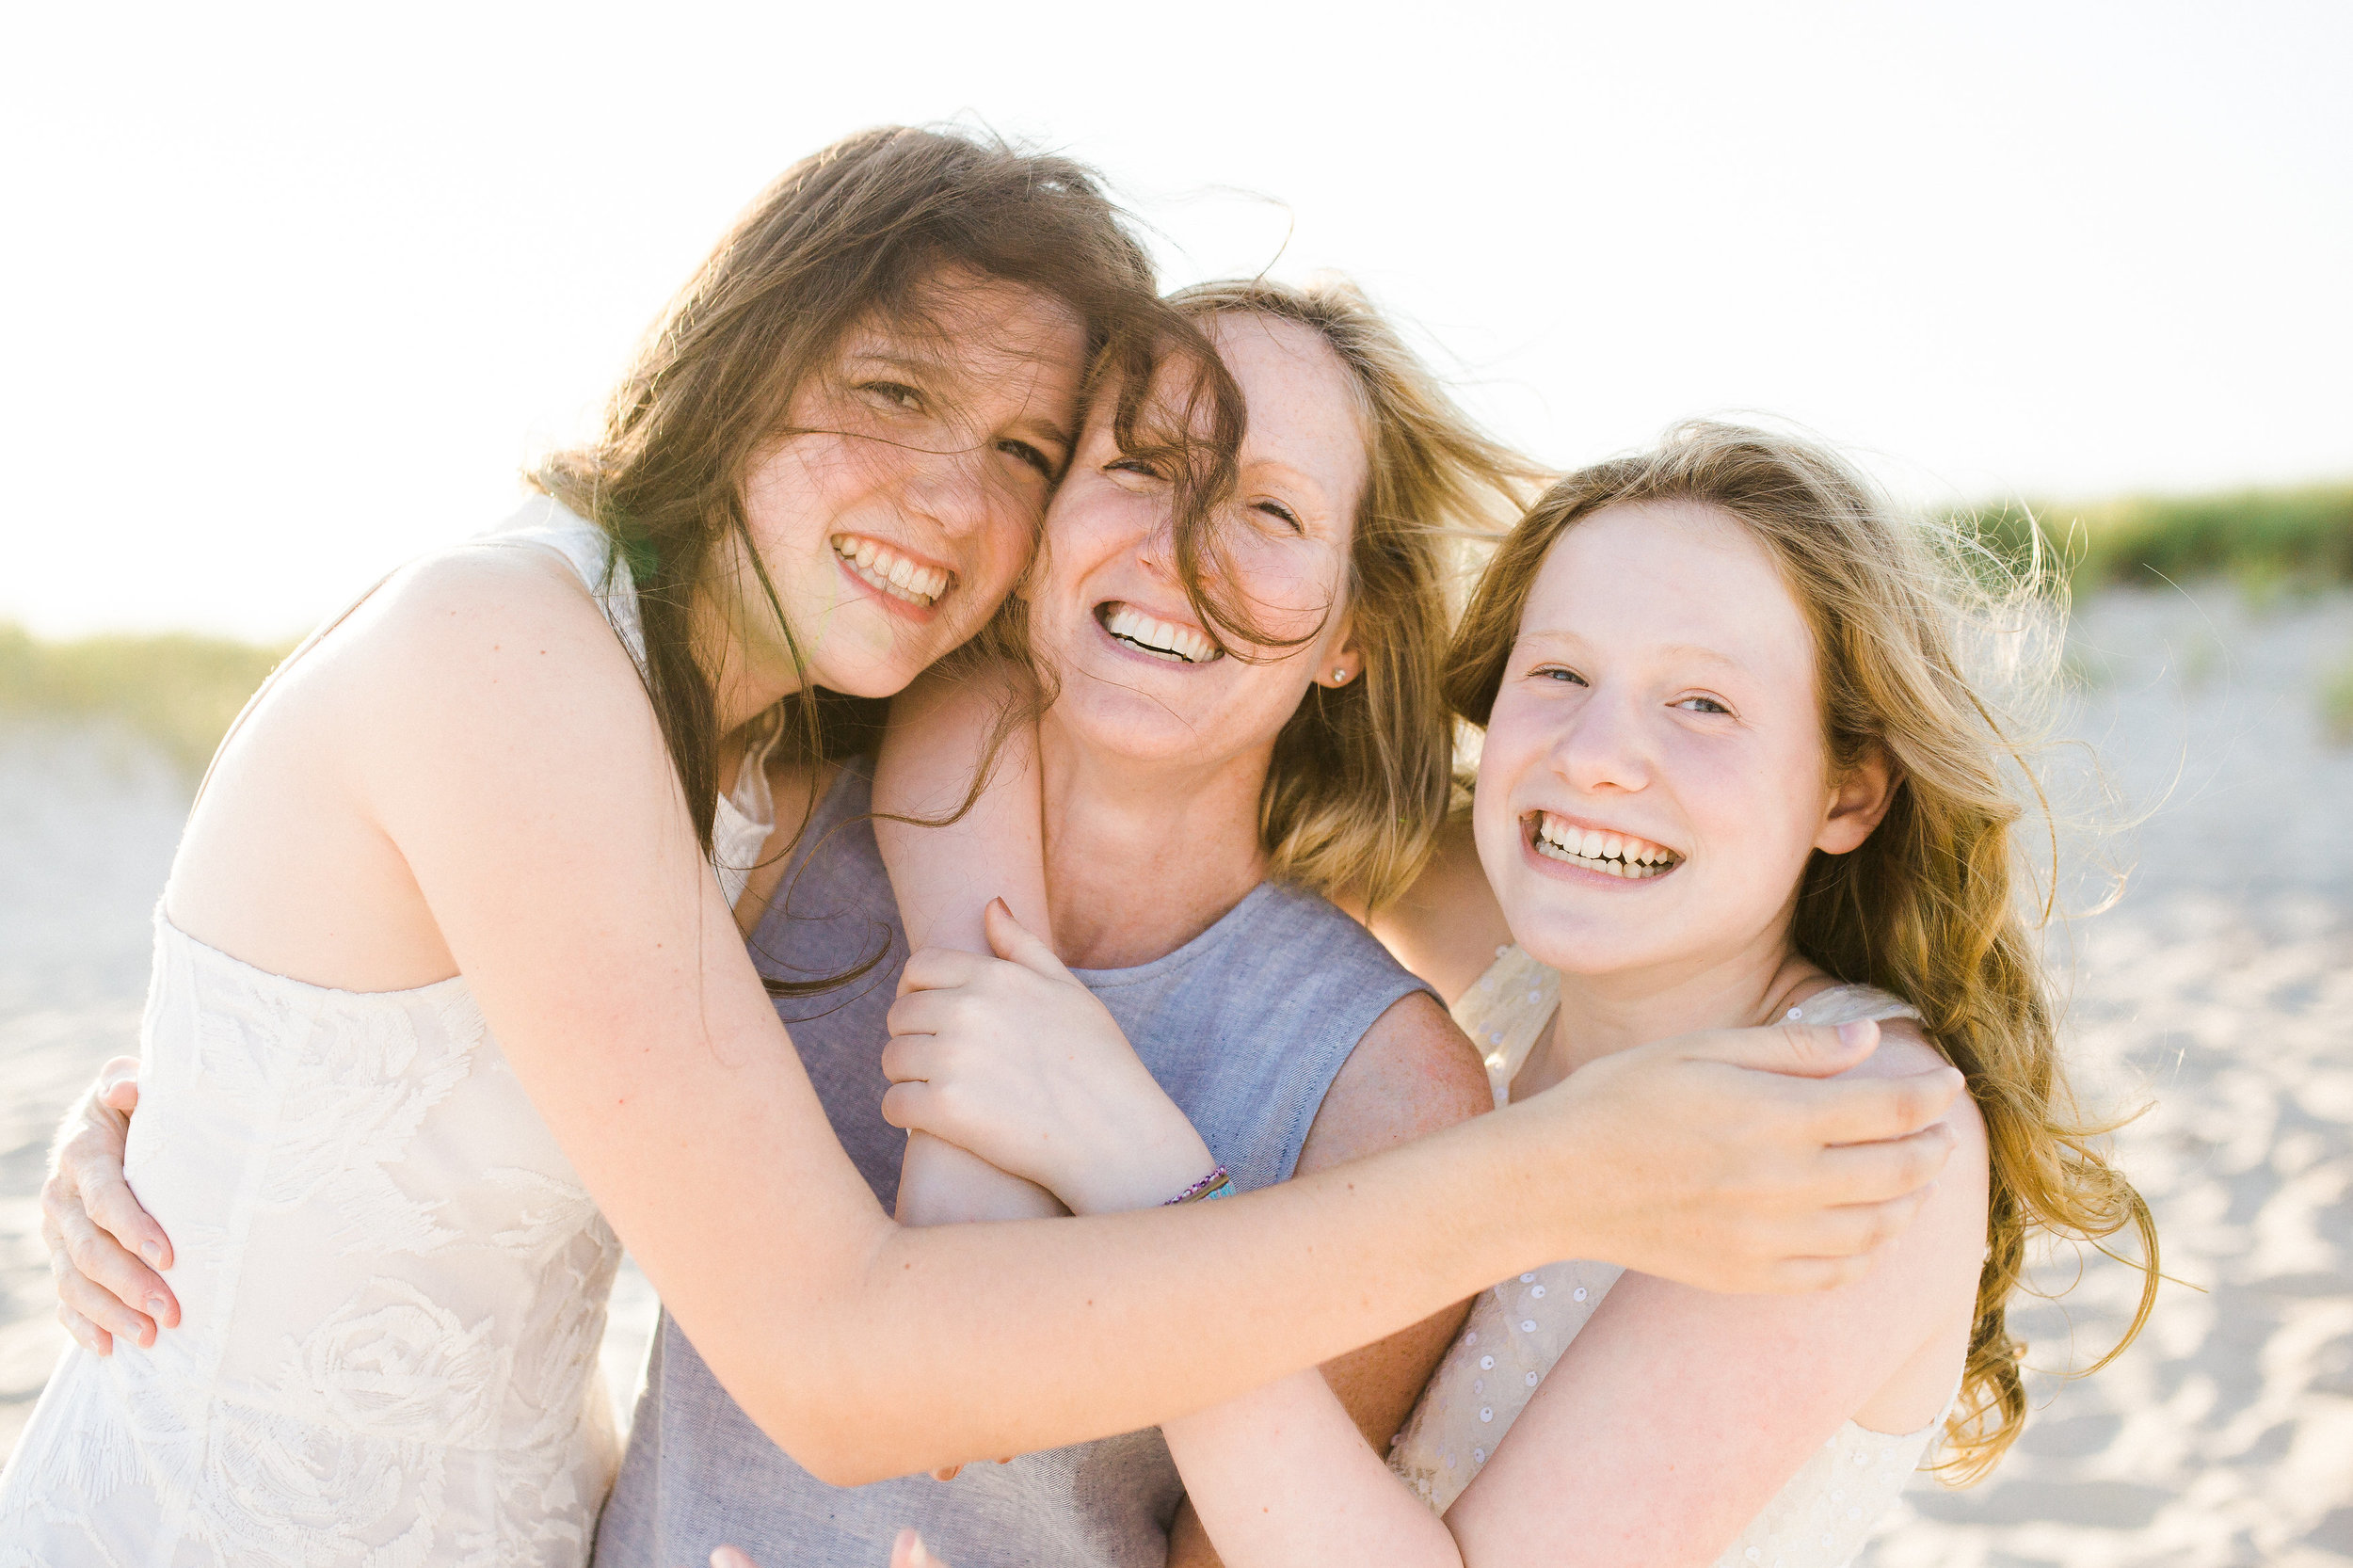 hamptons_beach_family_child_photographer-17.jpg